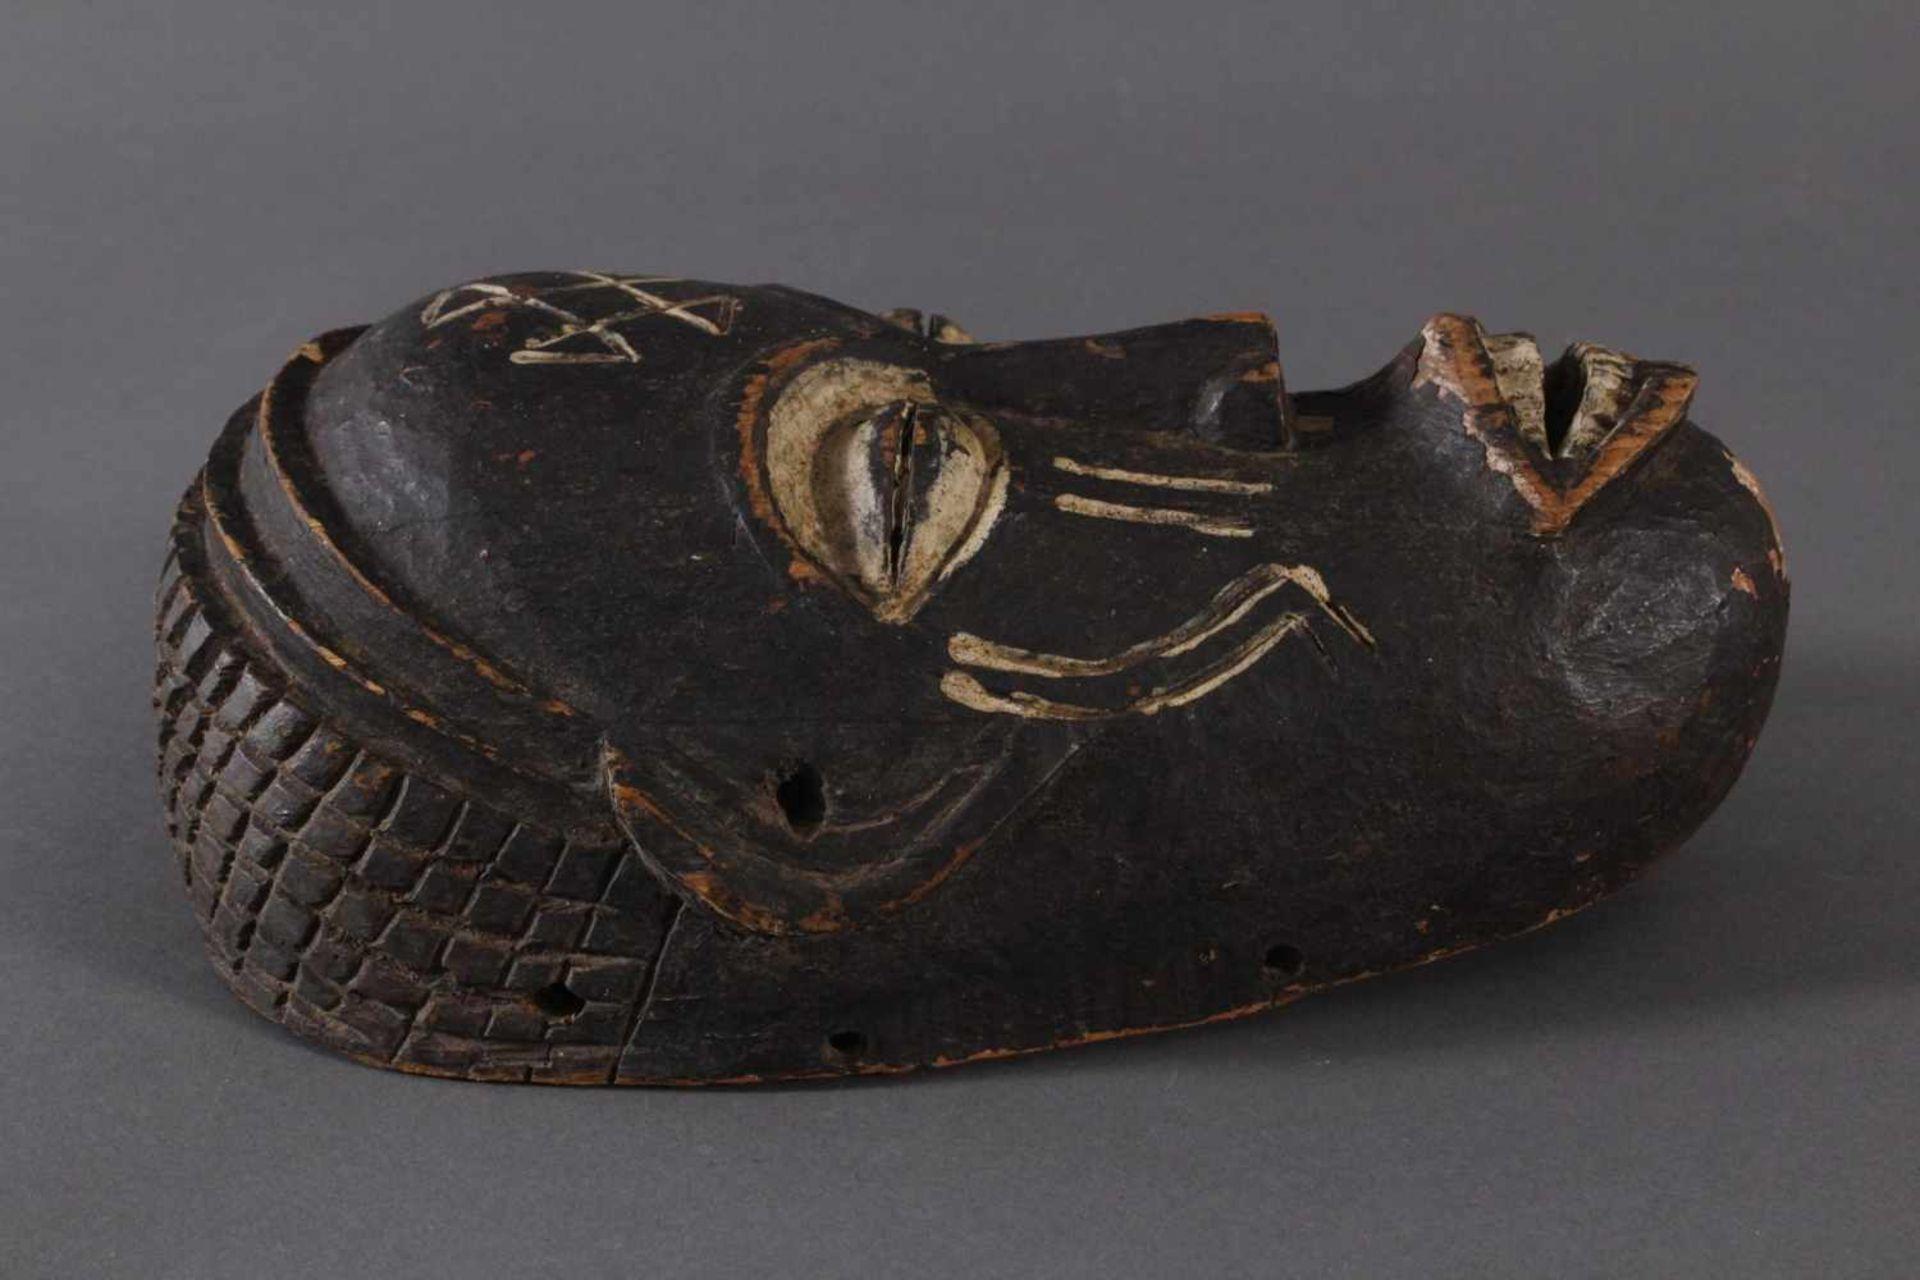 Antike Maske, Chokwe, Angola 1. Hälfte 20. Jh.Holz geschnitzt, dunkle Patina und Kaolin Bemalung, - Bild 2 aus 6